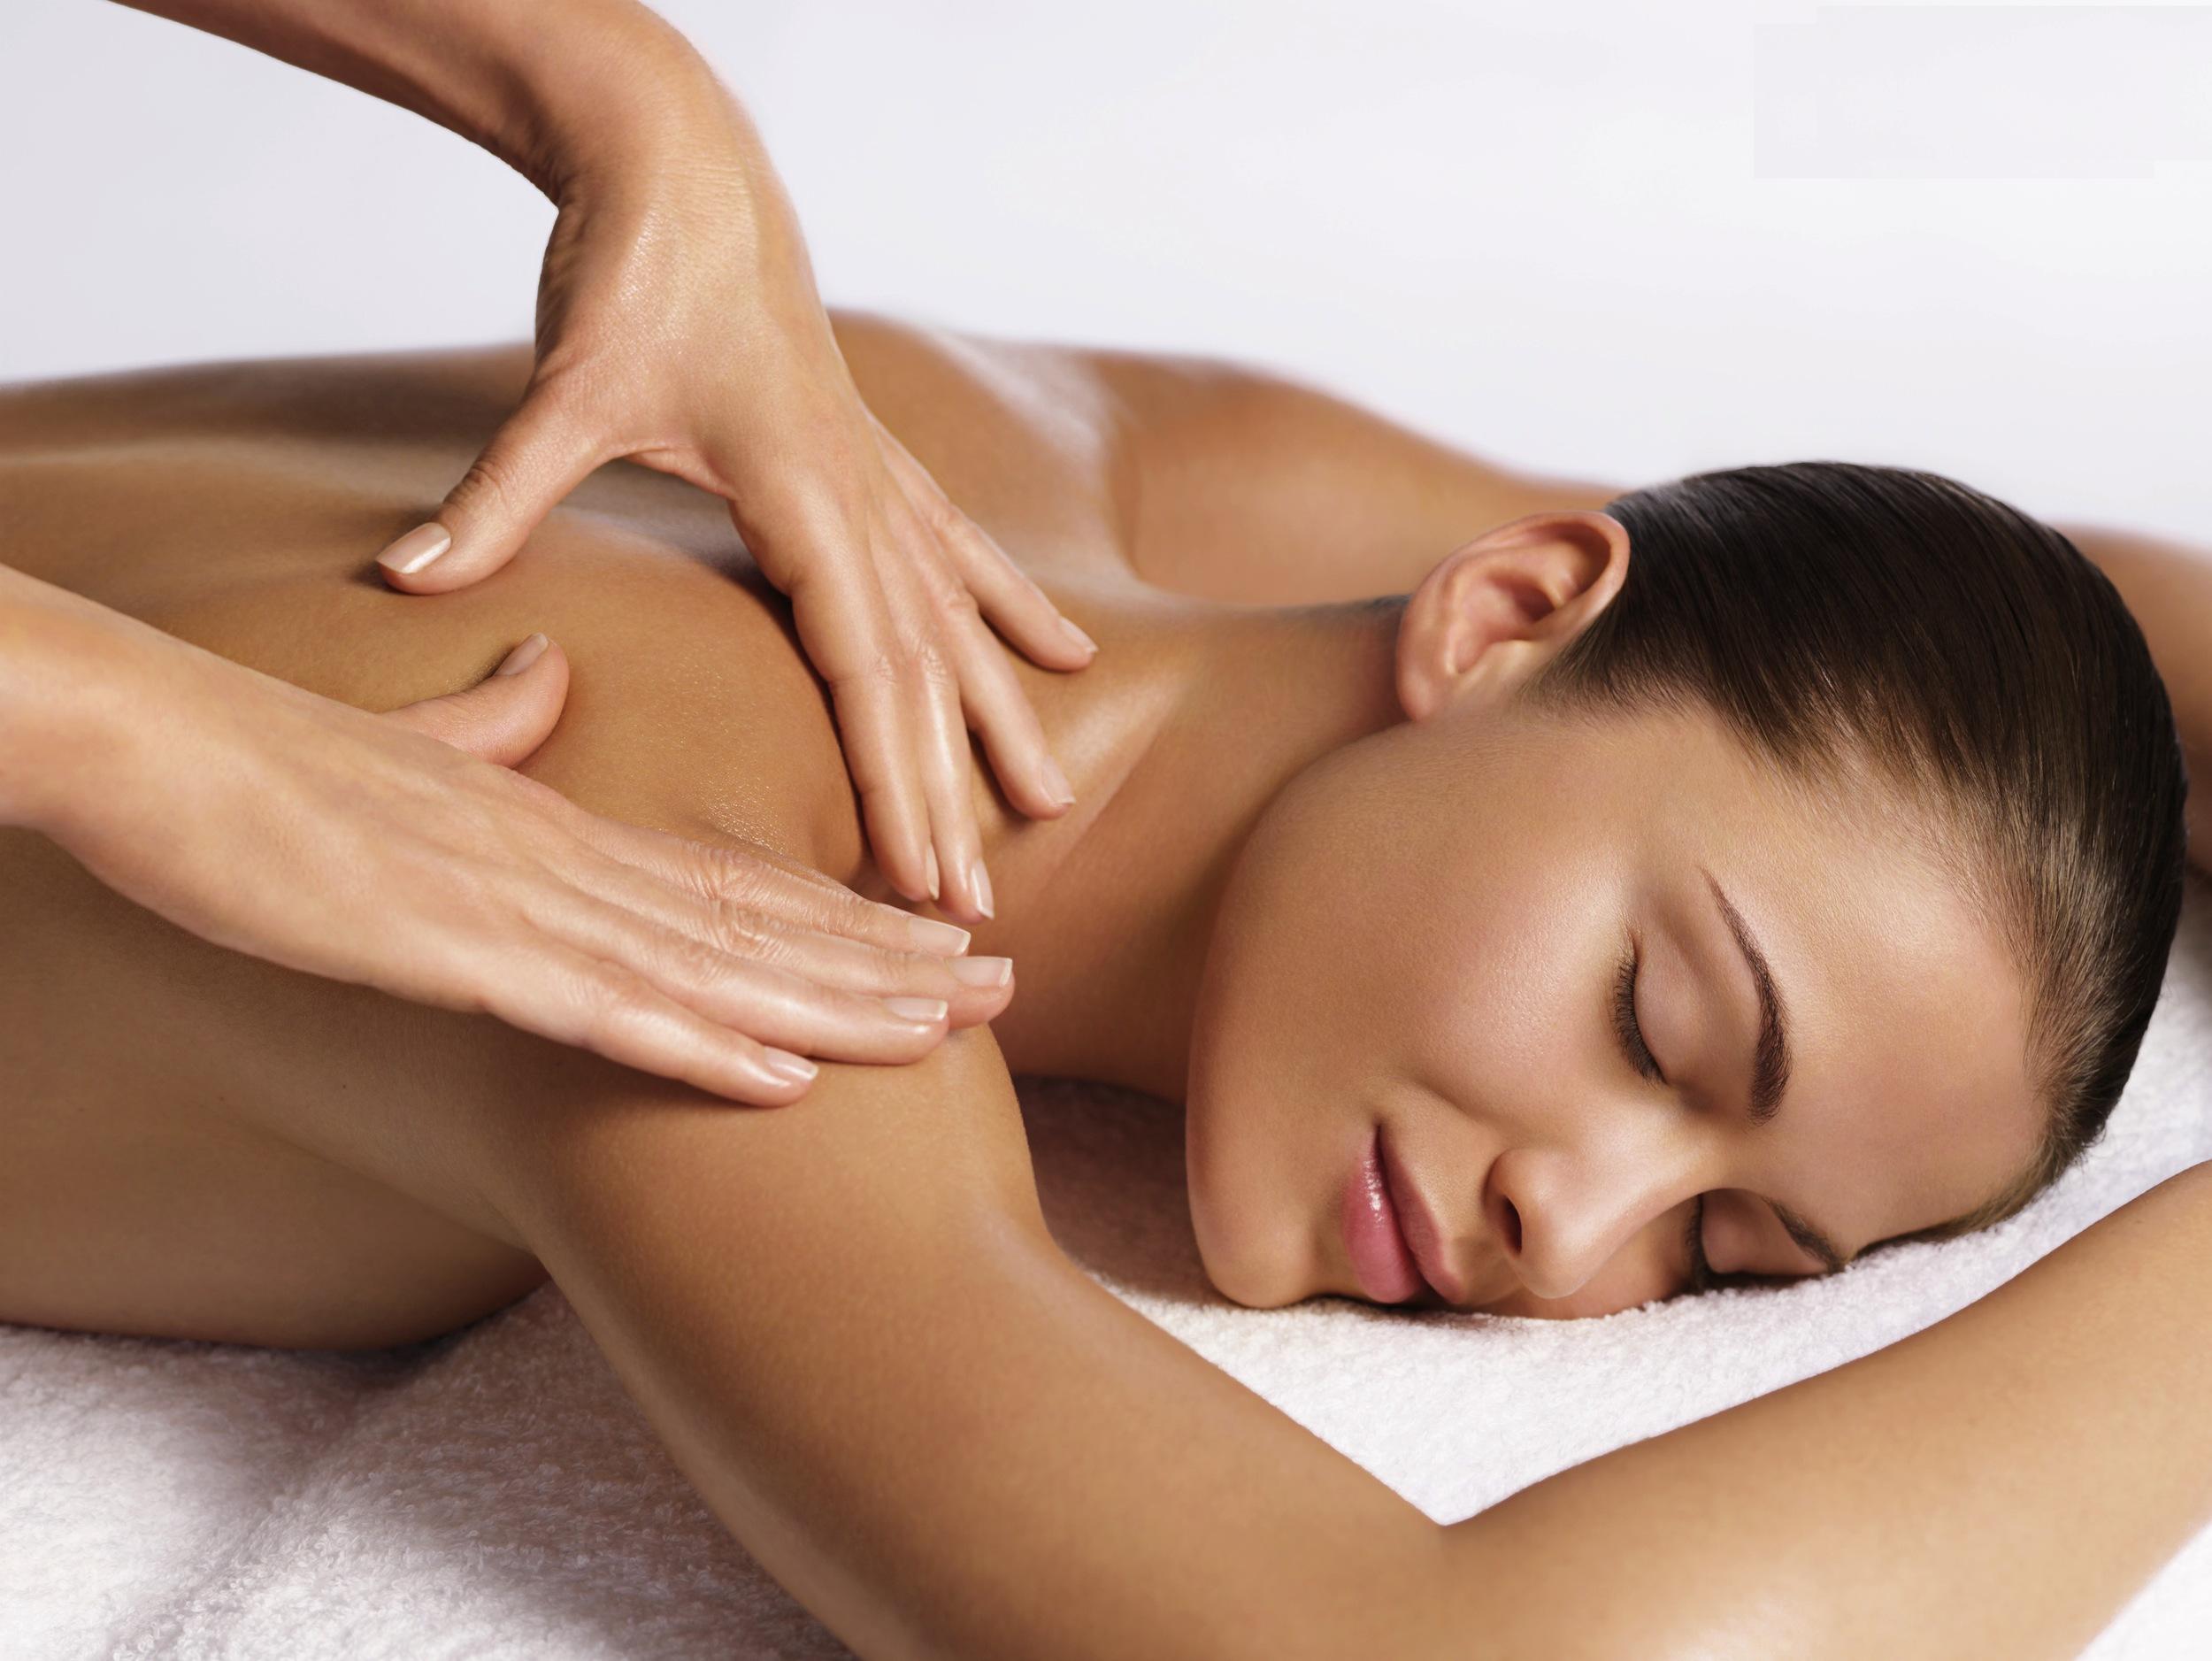 main_Massage03.jpg